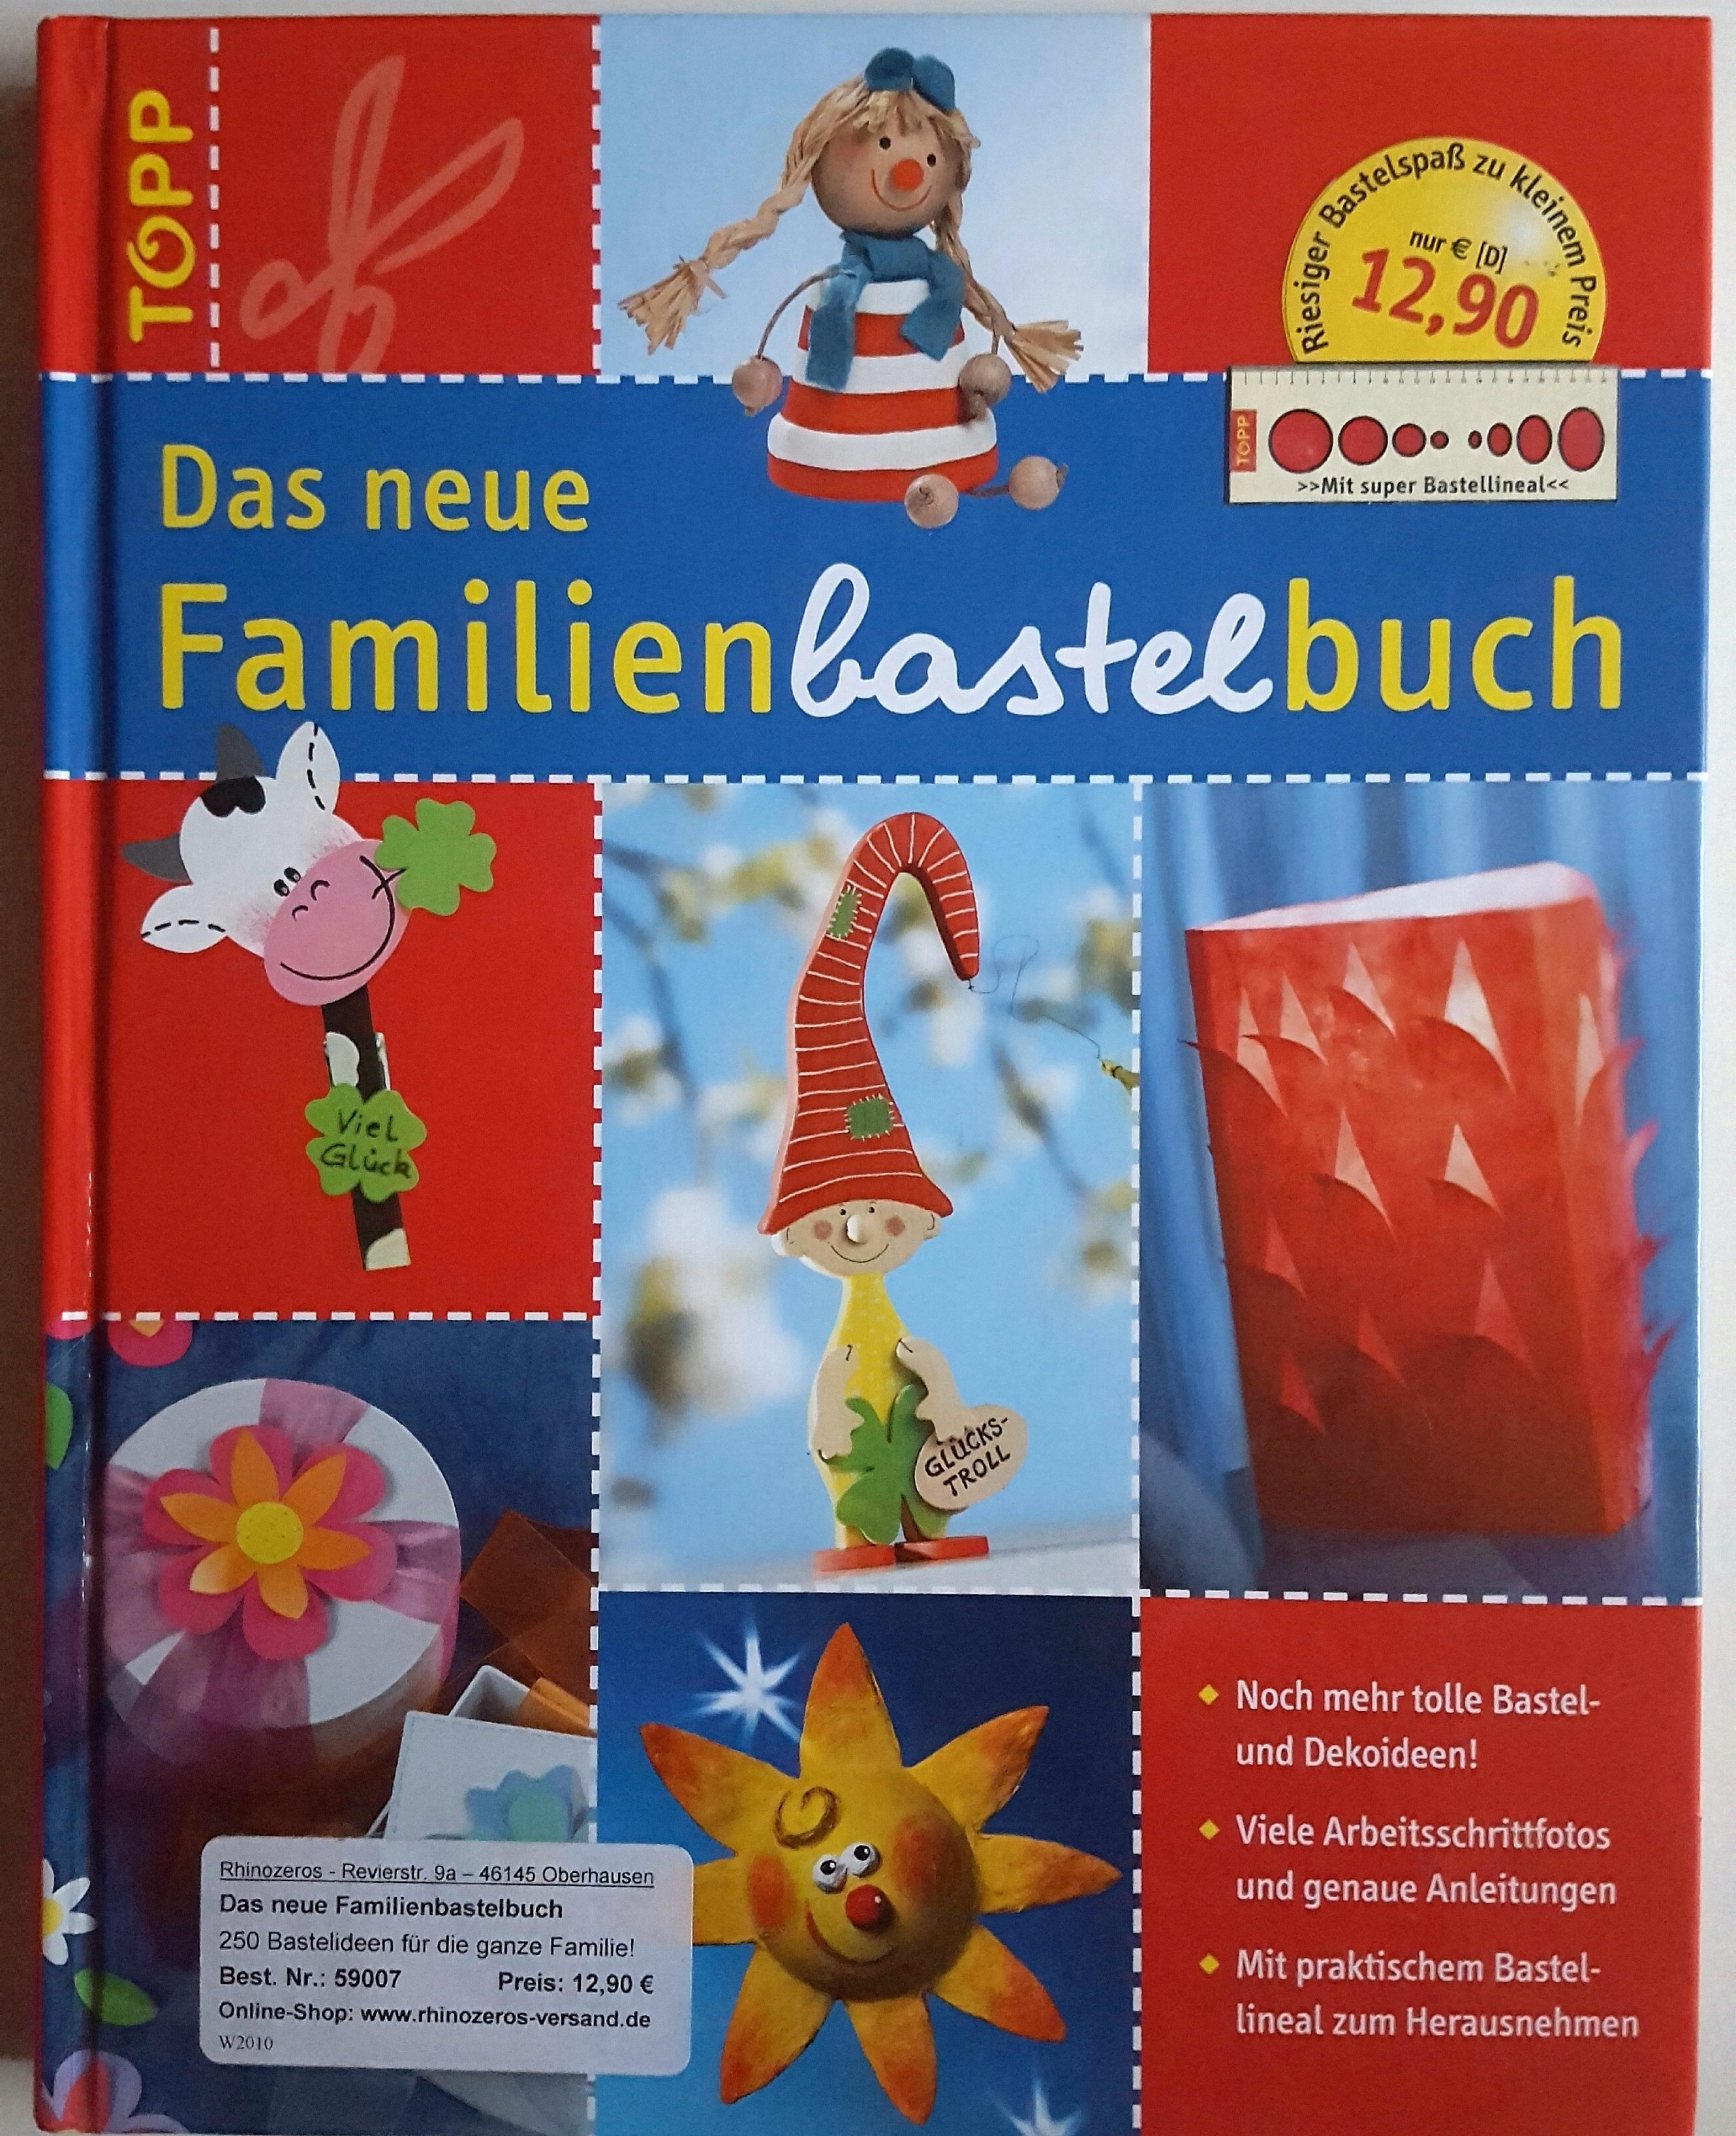 Das neue Familienbastelbuch 210